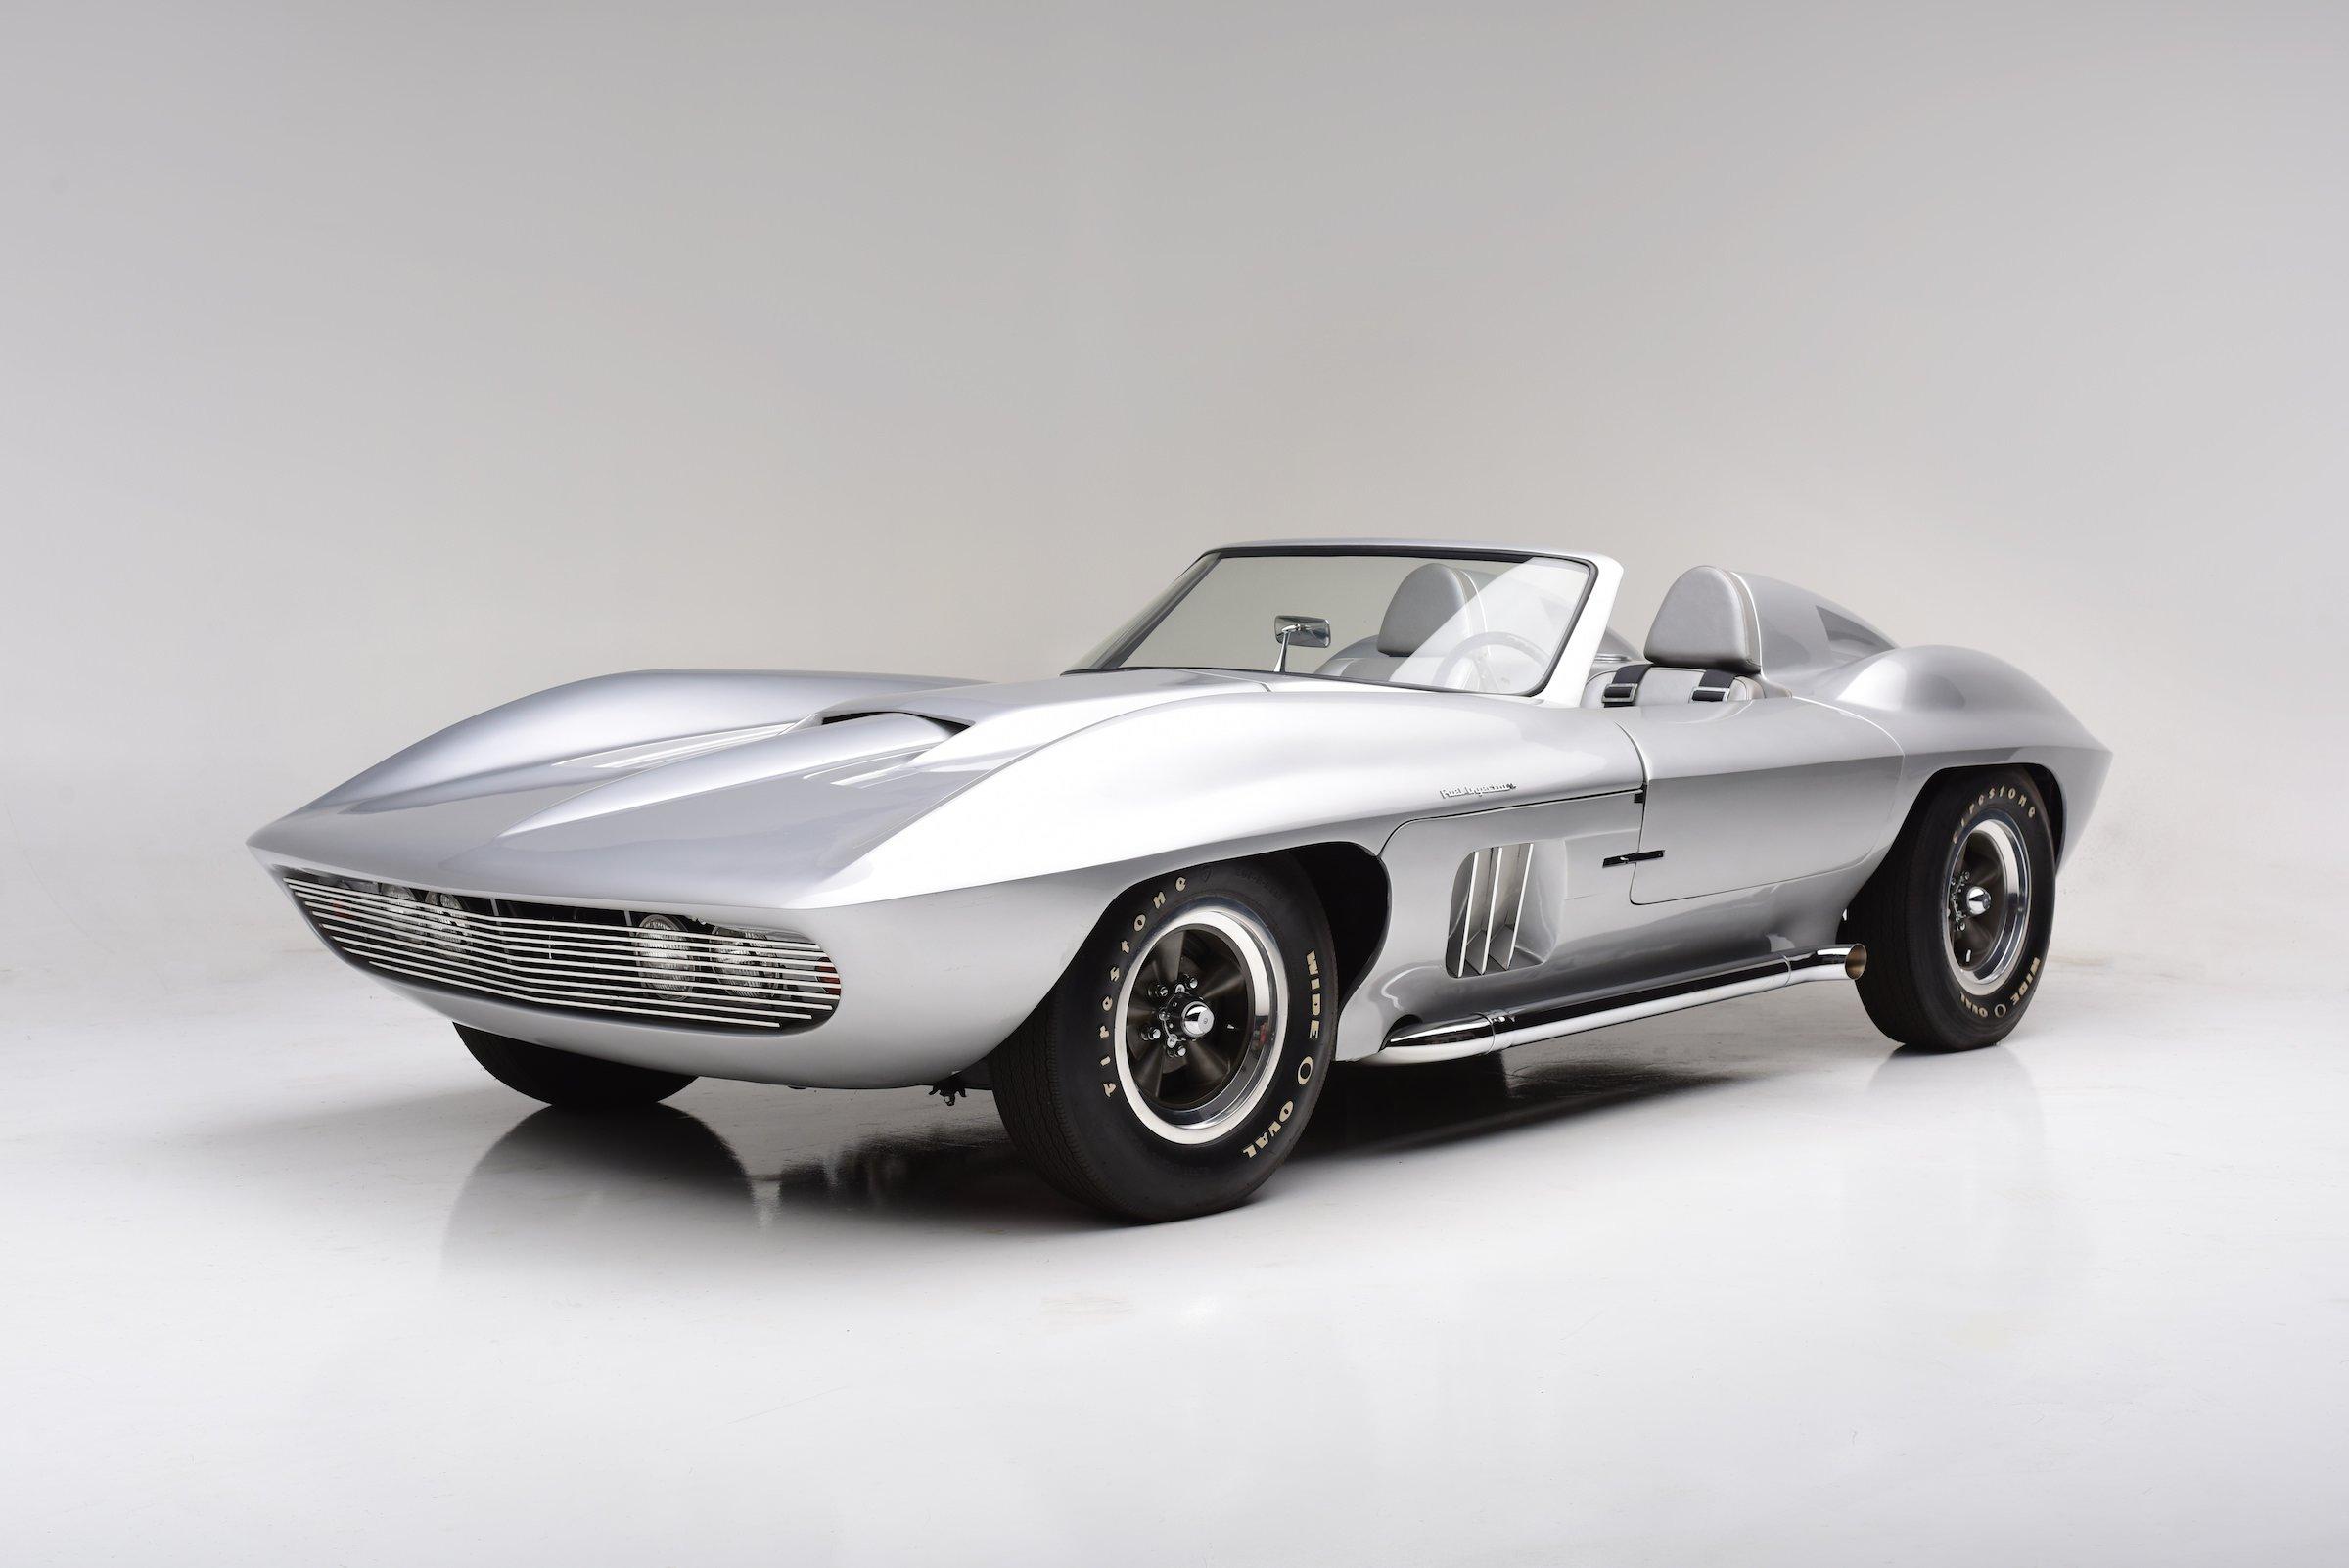 2017 Corvette Stingray >> 1958 Fiberfab Centurion Corvette